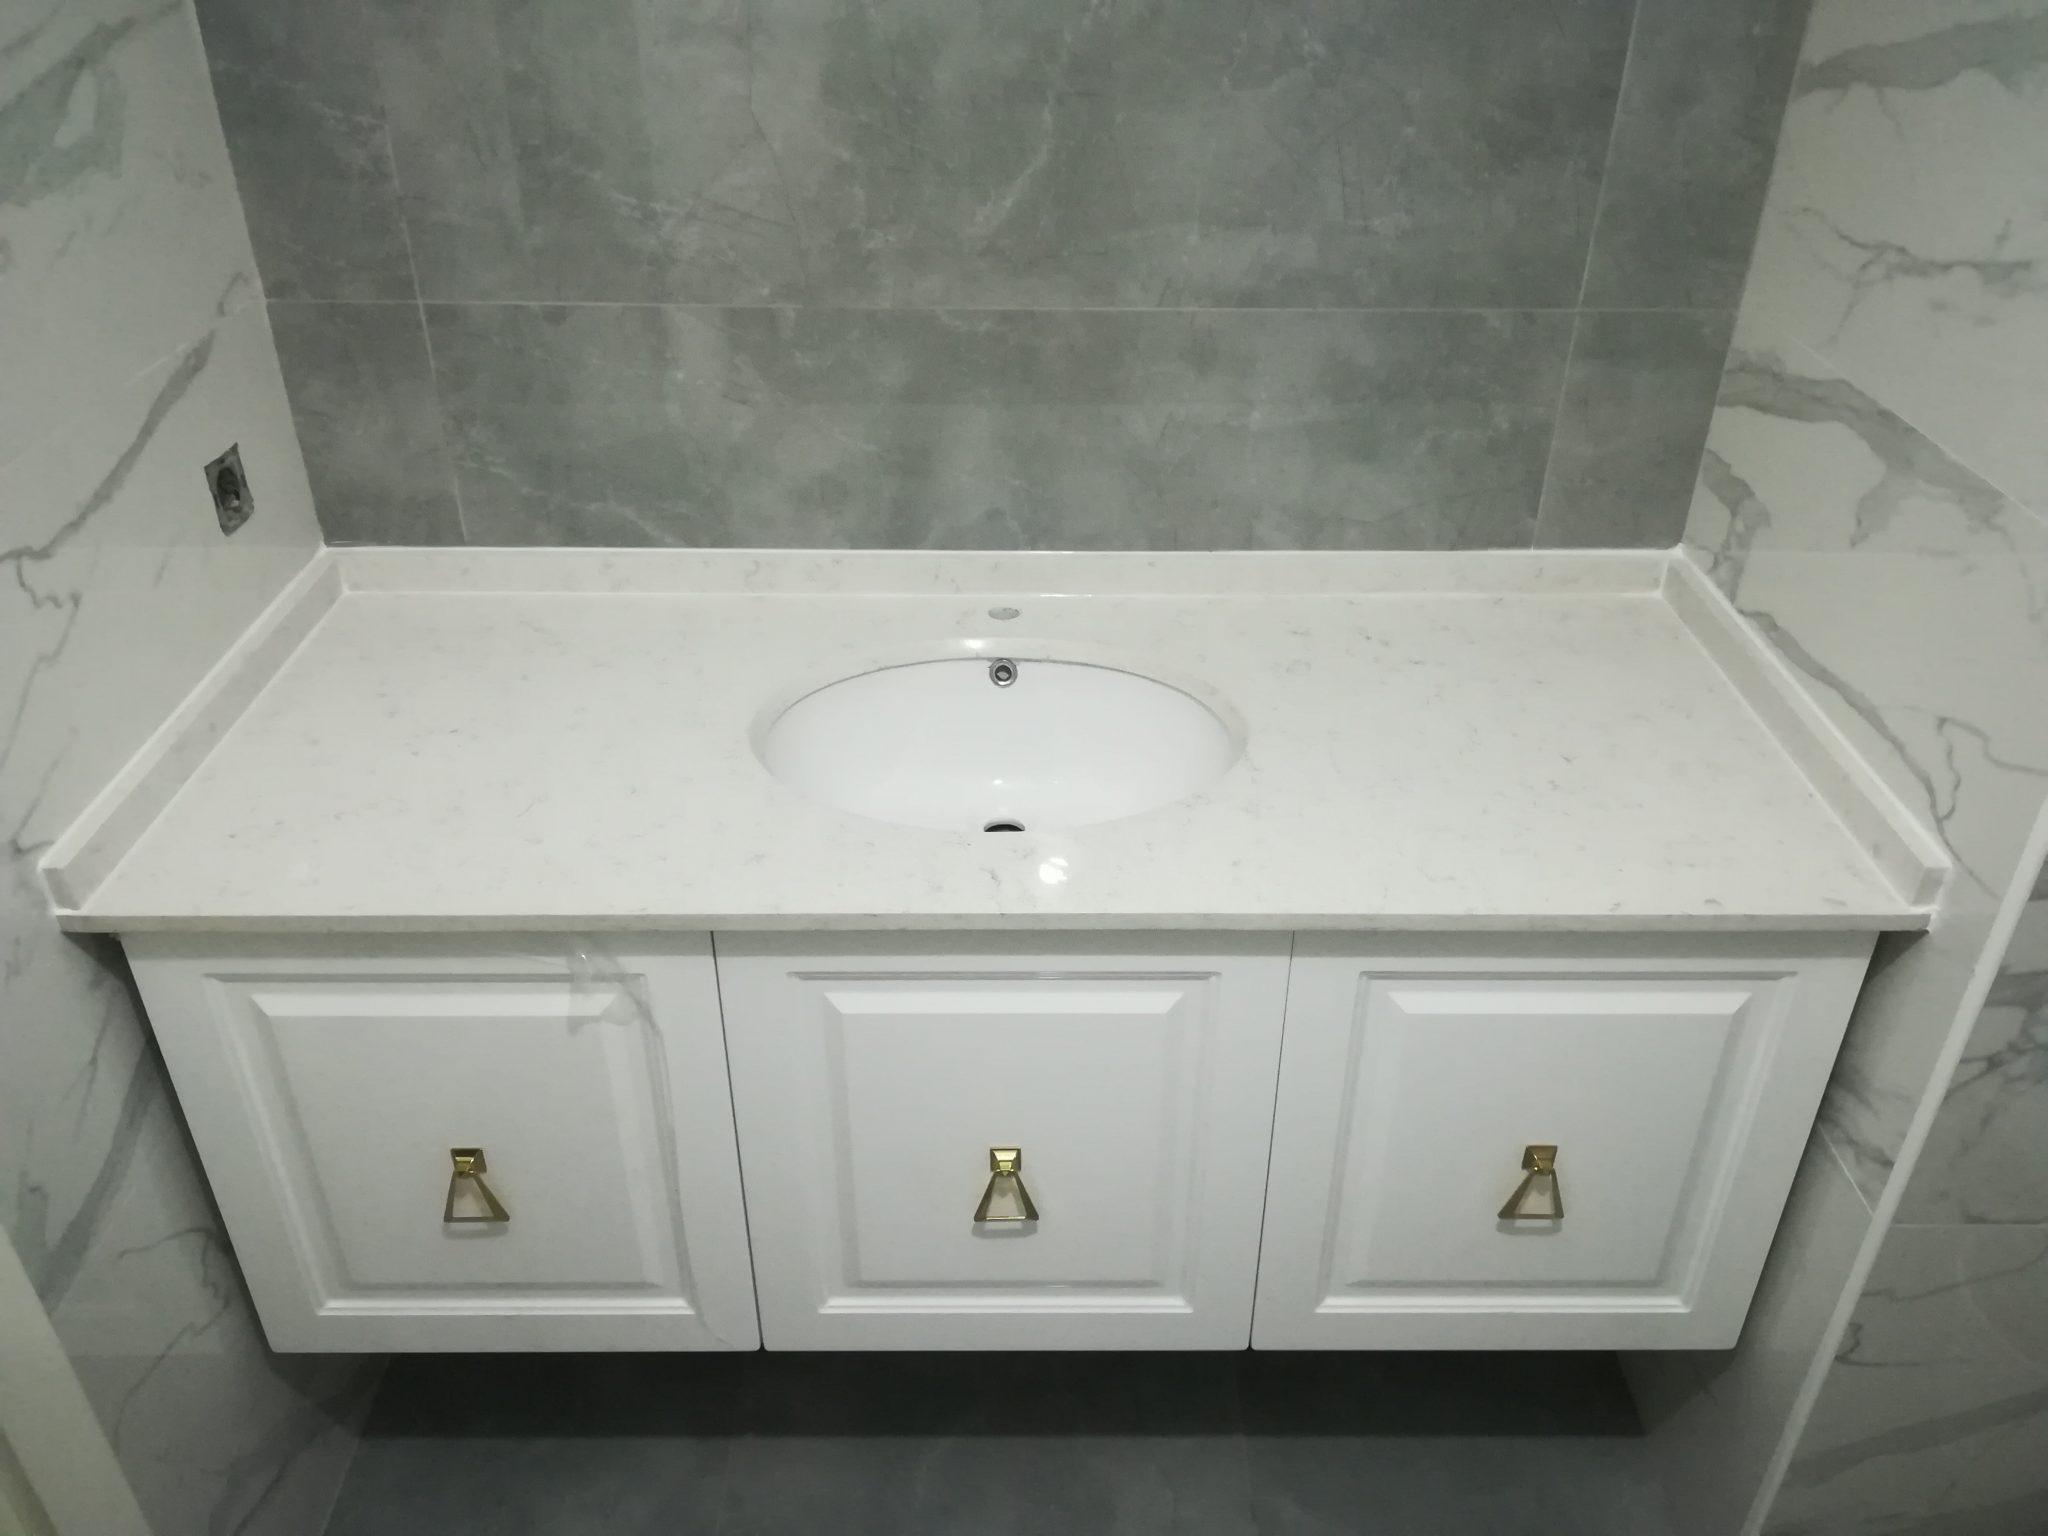 Beylikdüzü Beyaz Olympos Banyo Tezgahı